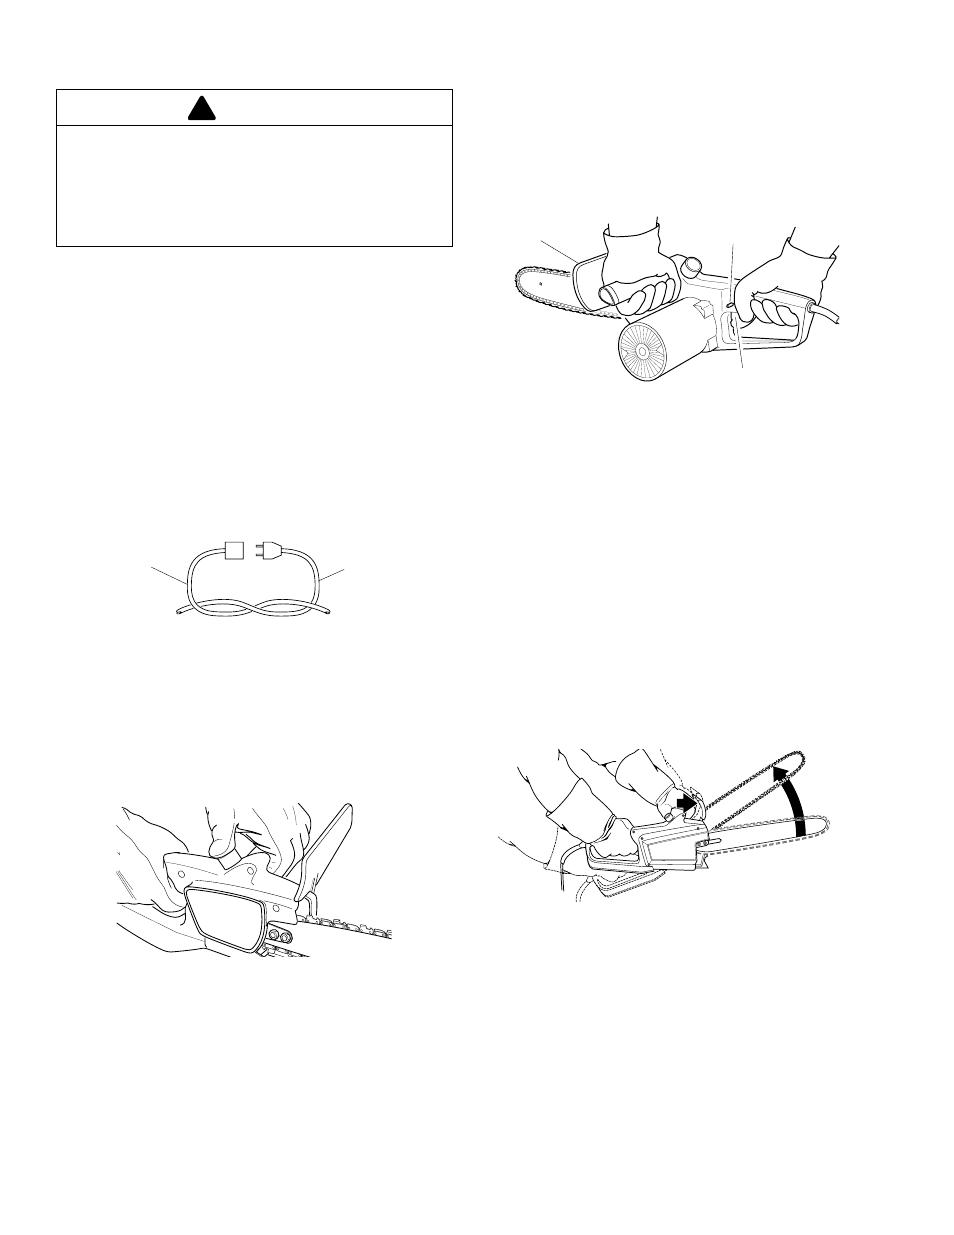 warning operating chain saw remington power tools 100271 01 user rh manualsdir com Total Commander Crack 8.01 Total Commander Crack 8.01